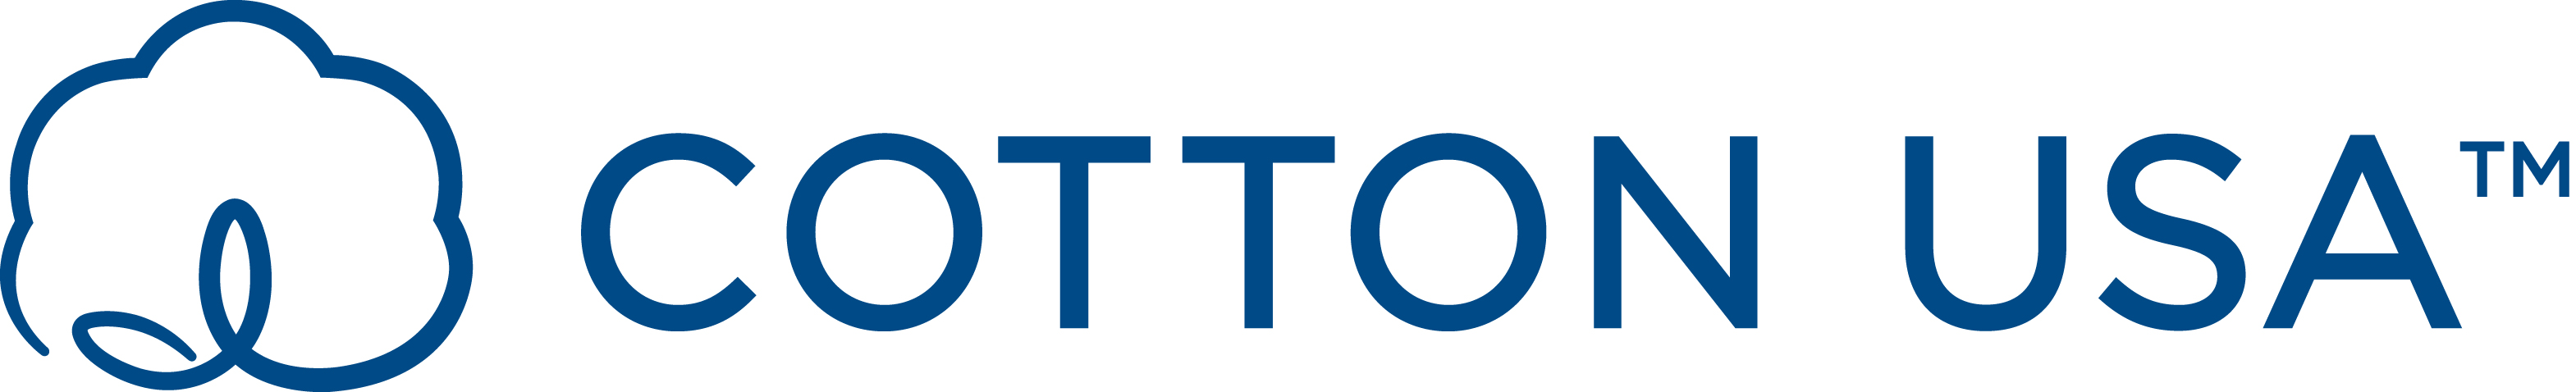 CCI_Horizontal_TM_Pantone301C (2)